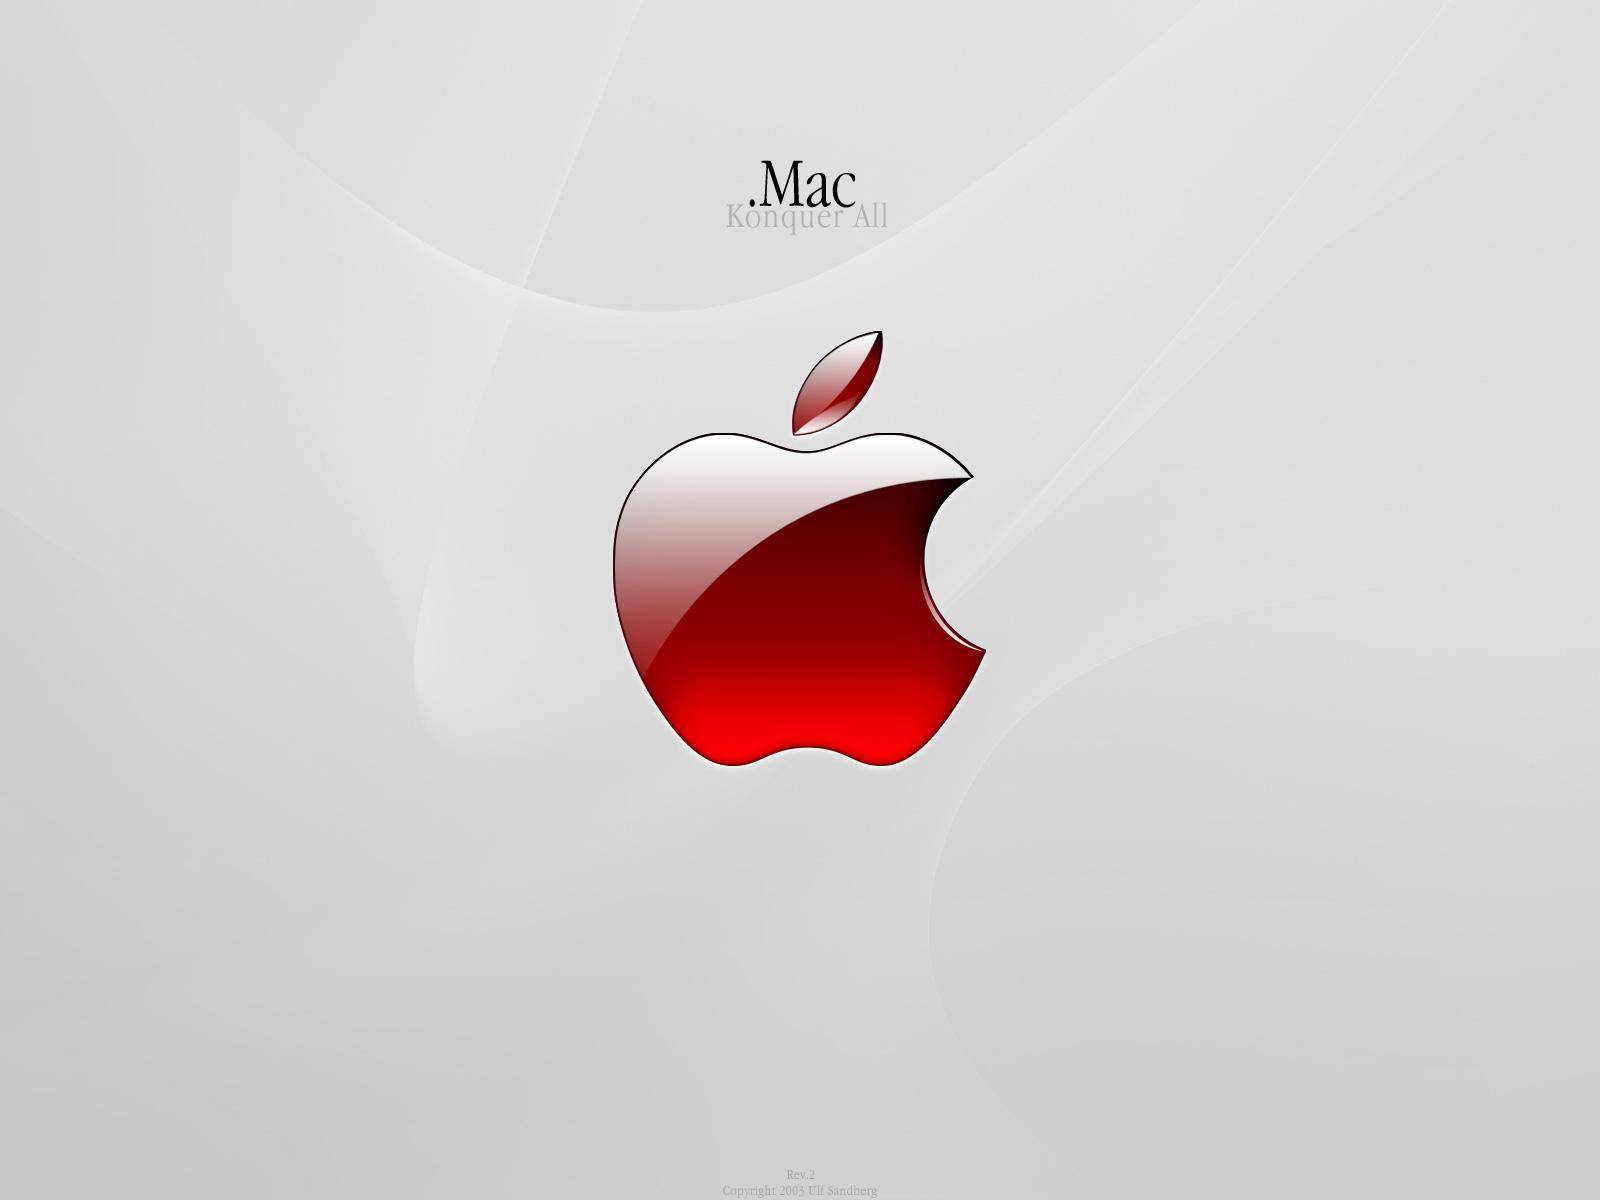 mac apple wallpapers hd apple wallpapers hd mac apple wallpapers 1600x1200